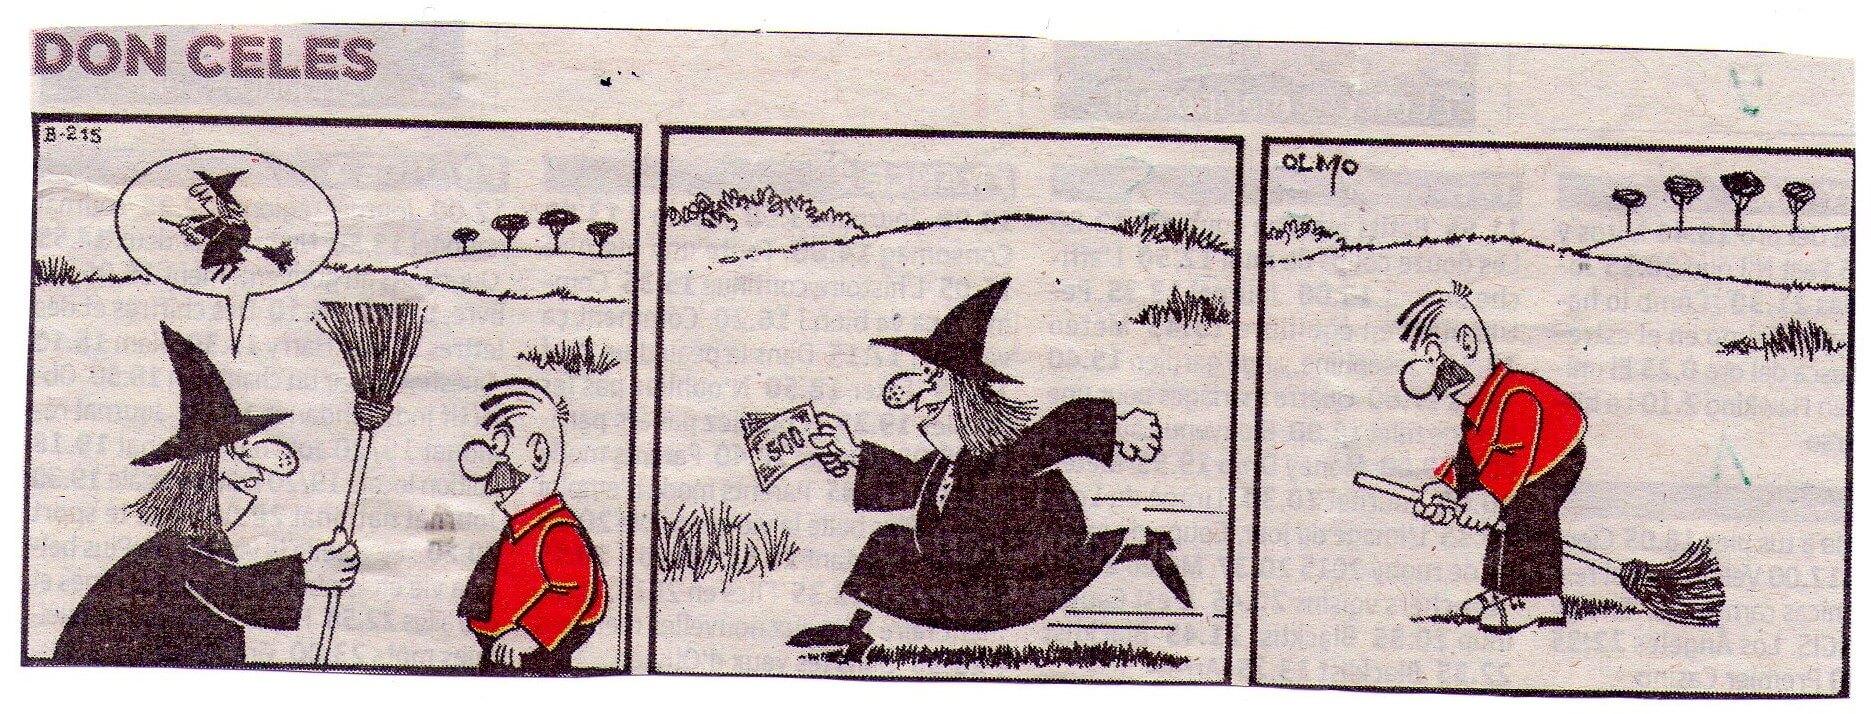 Don Celes timado por una bruja